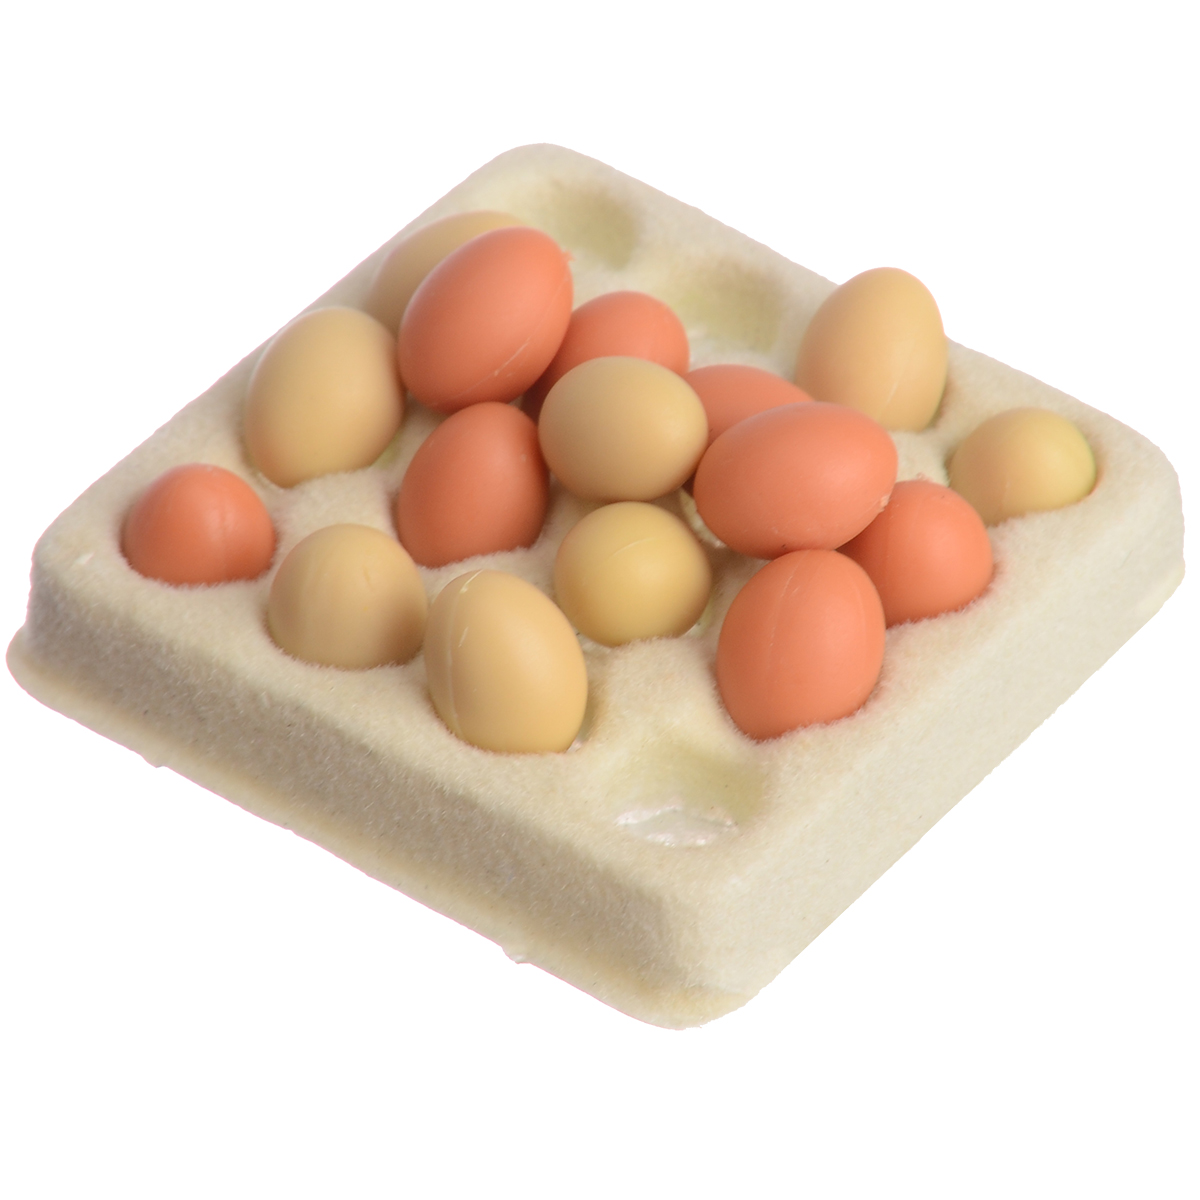 1:12 Dollhouse Miniature Bulk Mini Eggs Models Egg Tray 1 Set 16 Eggs 1 Tray